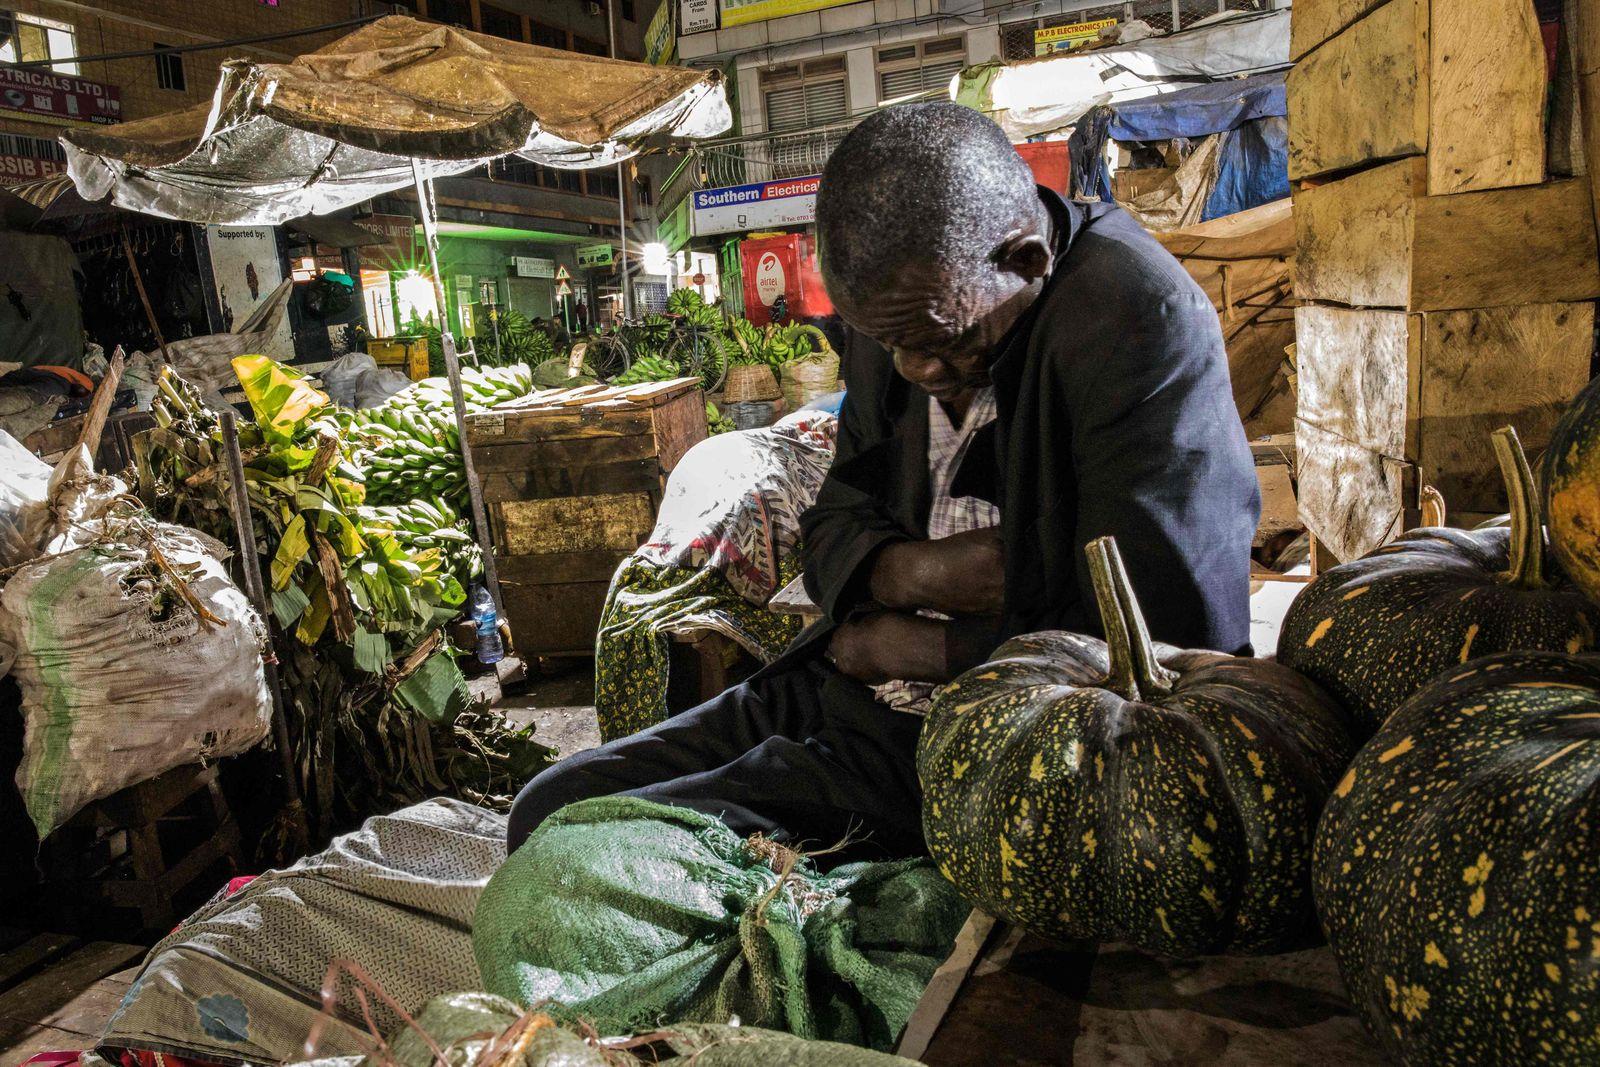 UGANDA-HEALTH-VIRUS-ECONOMY